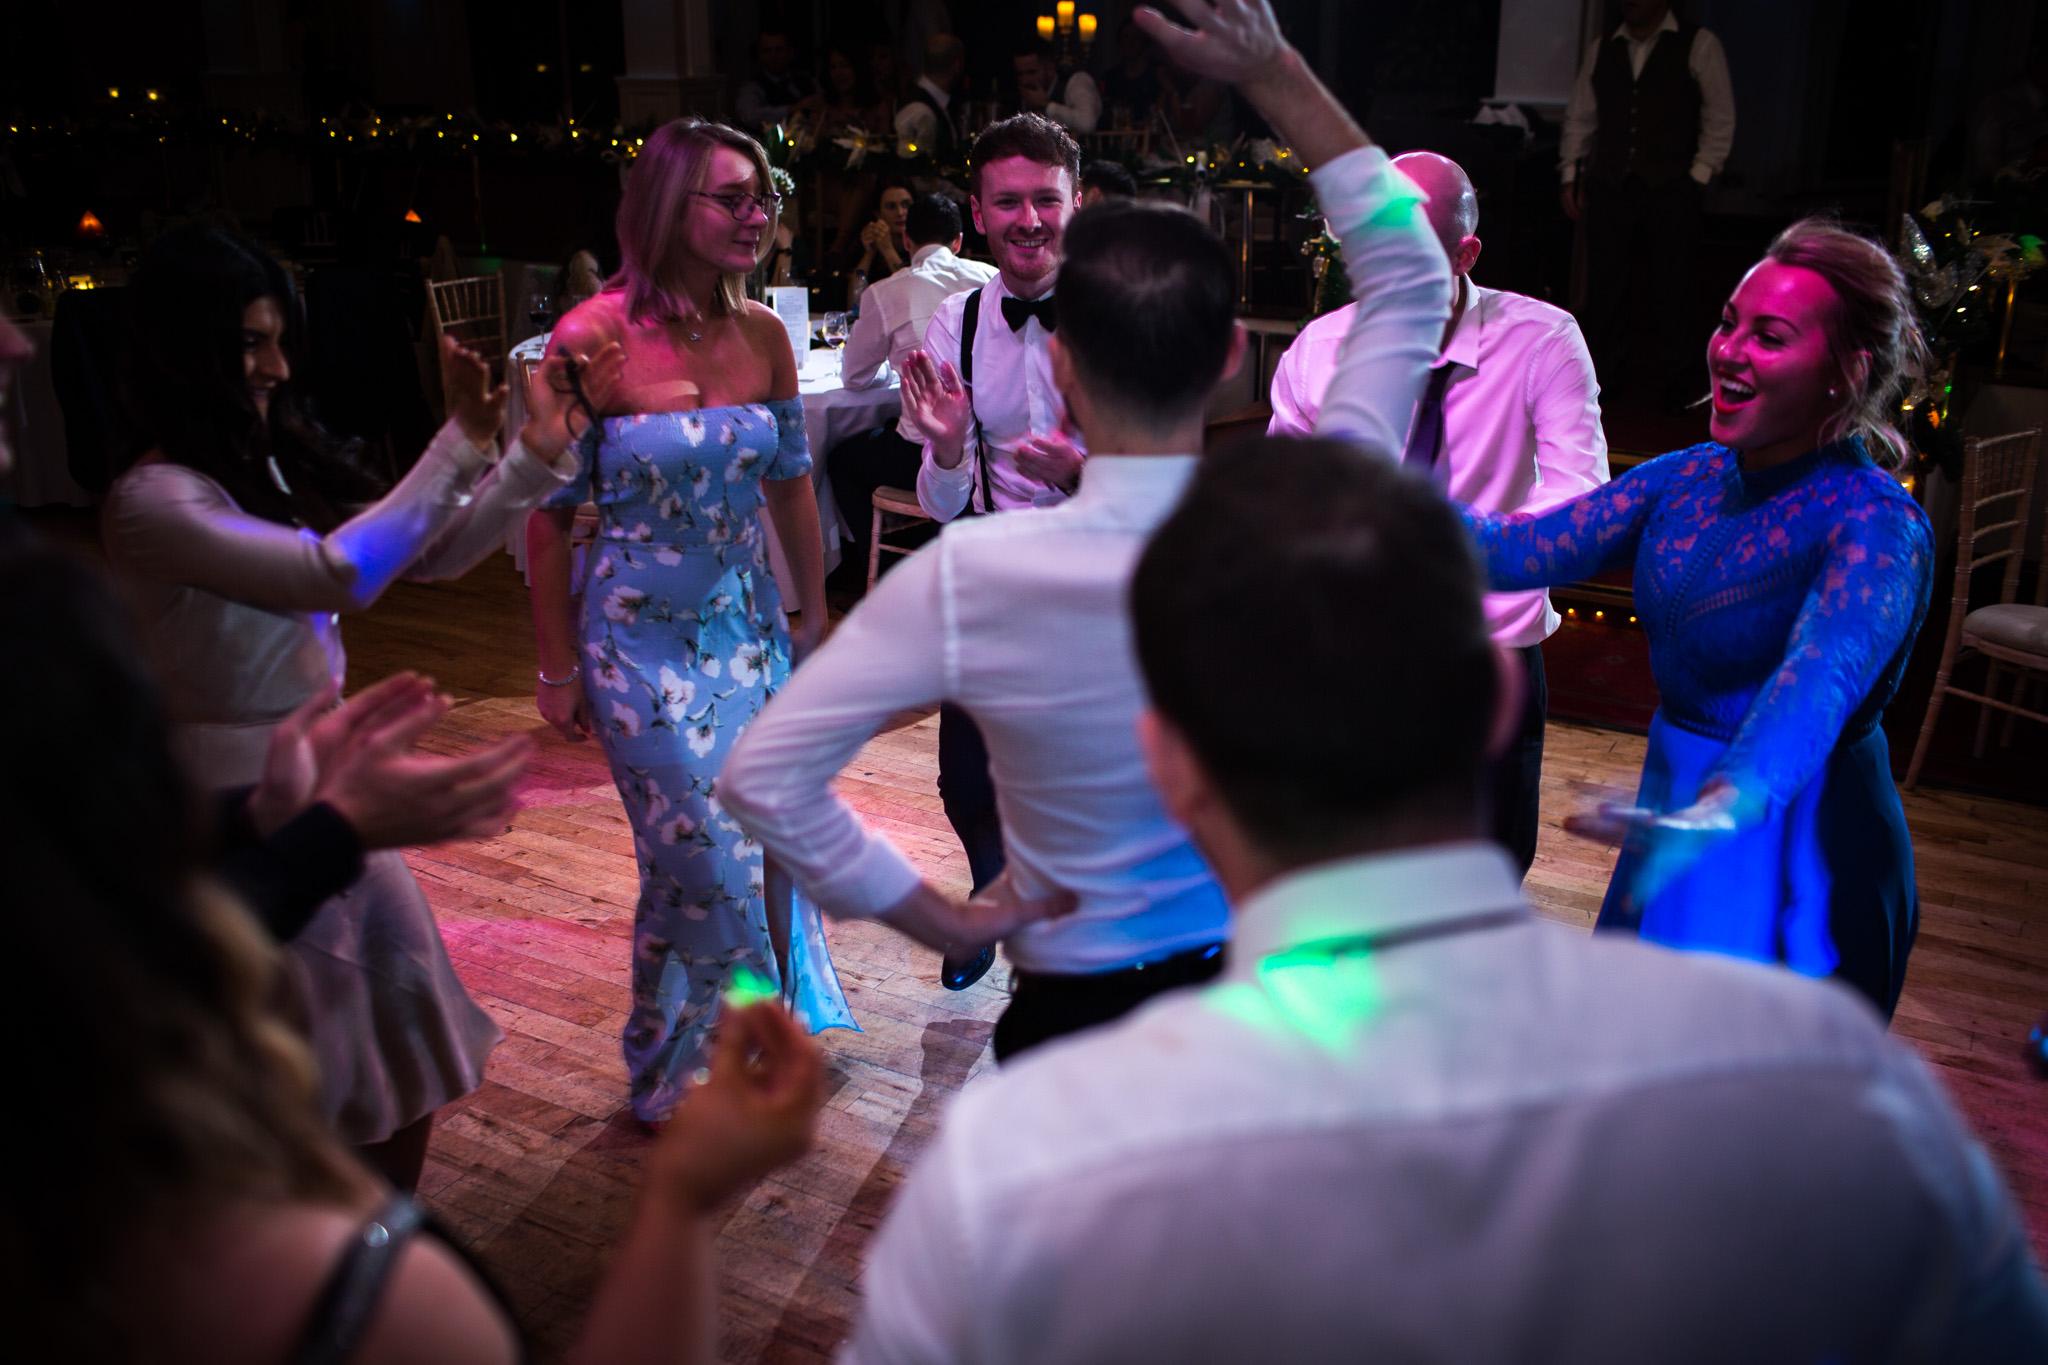 Mark_Barnes_Northern_Ireland_wedding_photographer_Harveys_Point_Donegall_Wedding_photography-Adam&Gemma-72.jpg